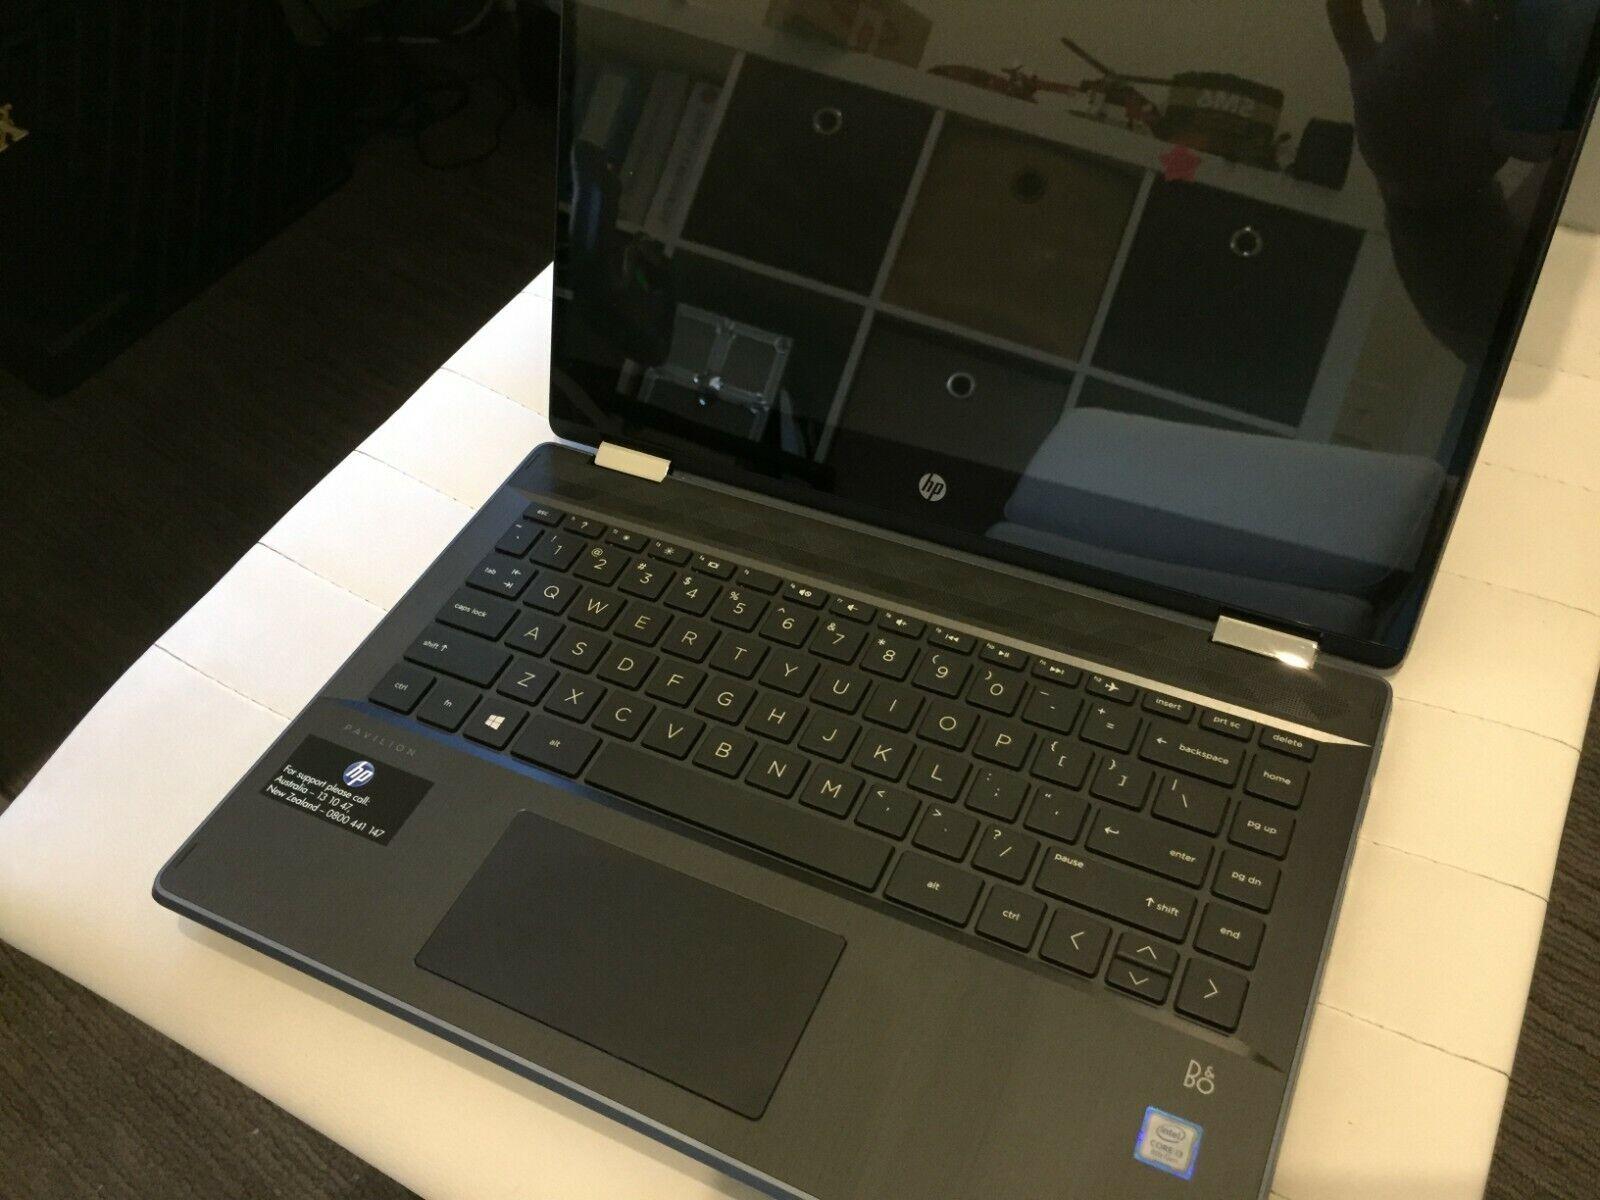 Laptop Windows - HP Pavilion x360 Intel core i3 8th Gen,128 GB SSD, 8GB RAM, Windows 10 Laptop